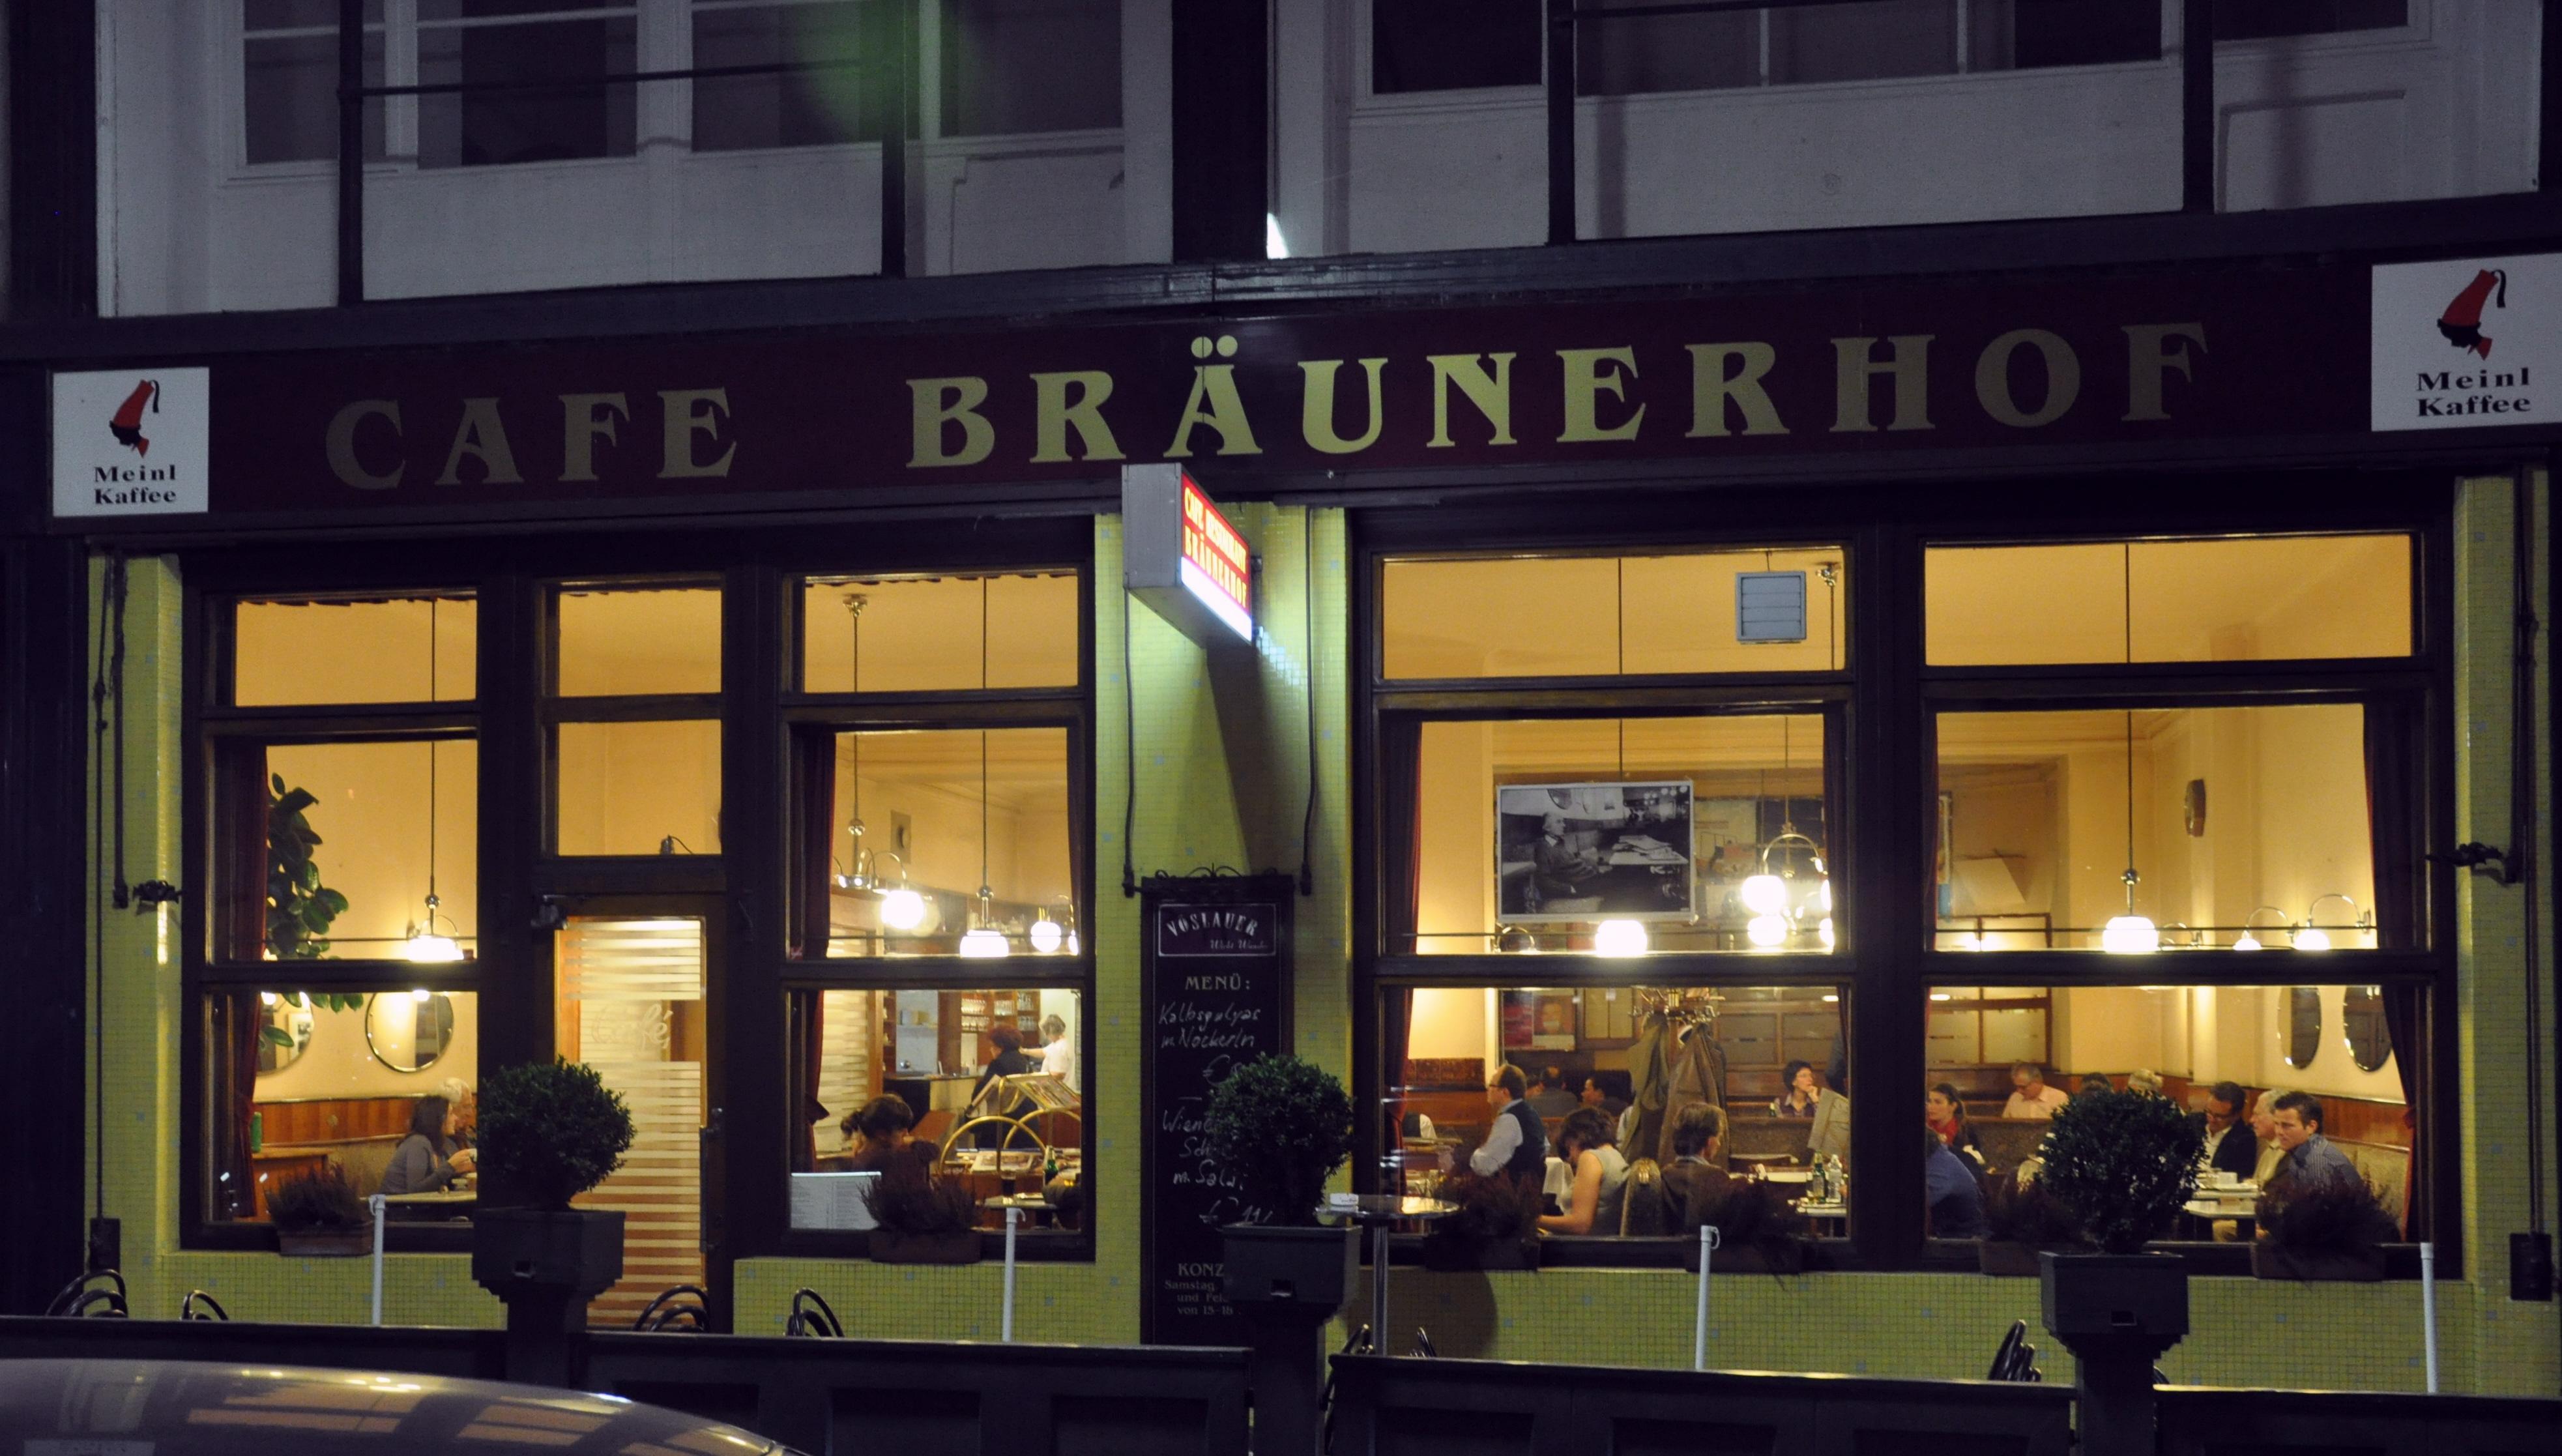 Cafe Br Ef Bf Bdunerhof Wien